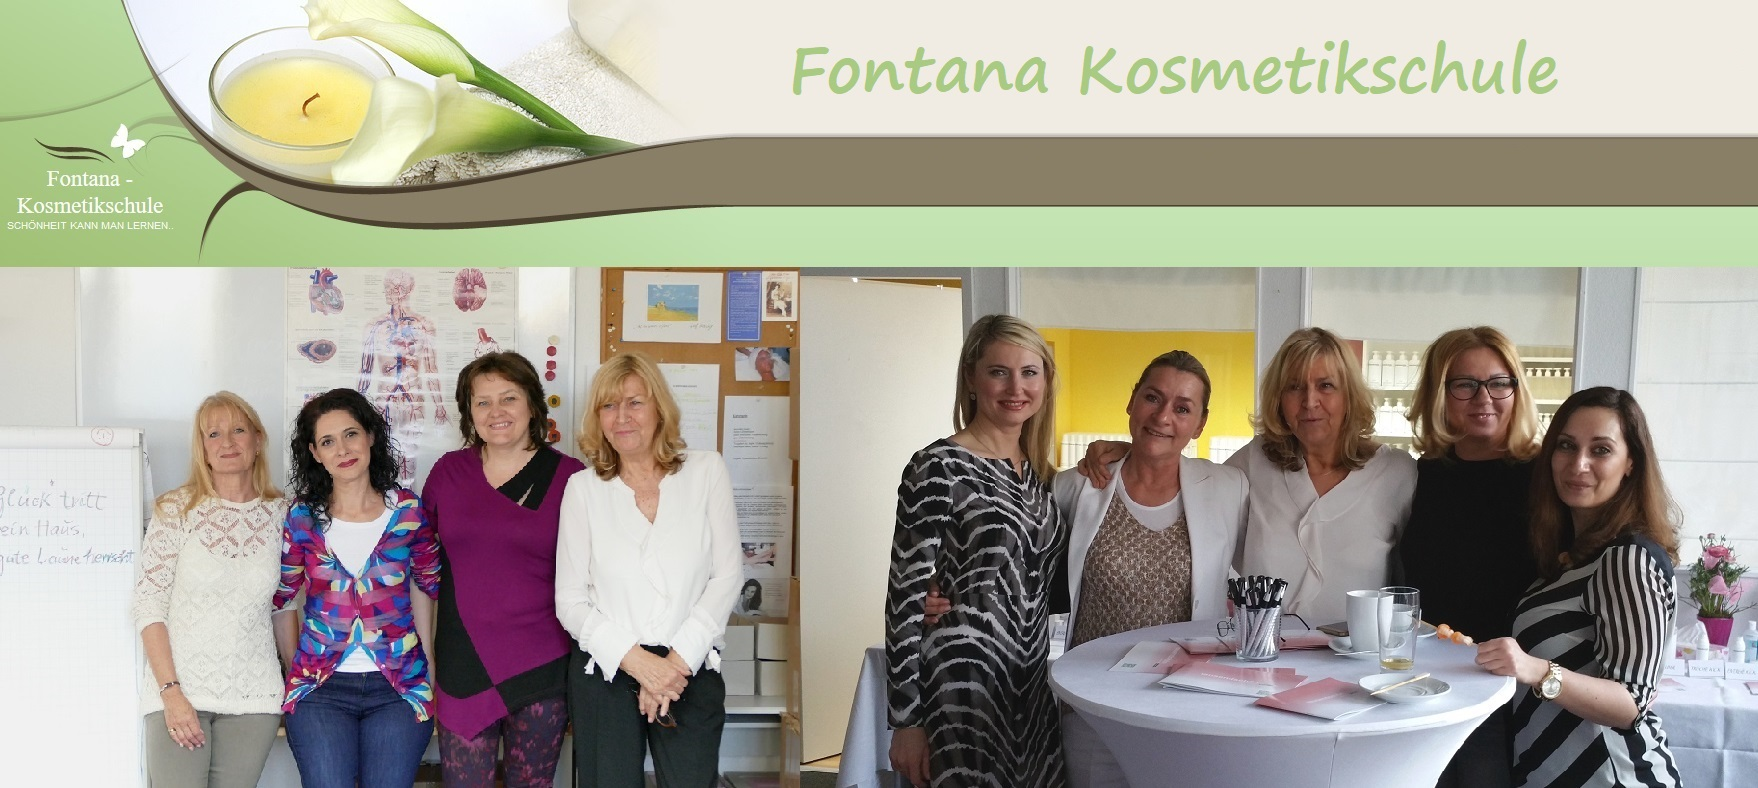 2019-Kosmetikschule-Fontana